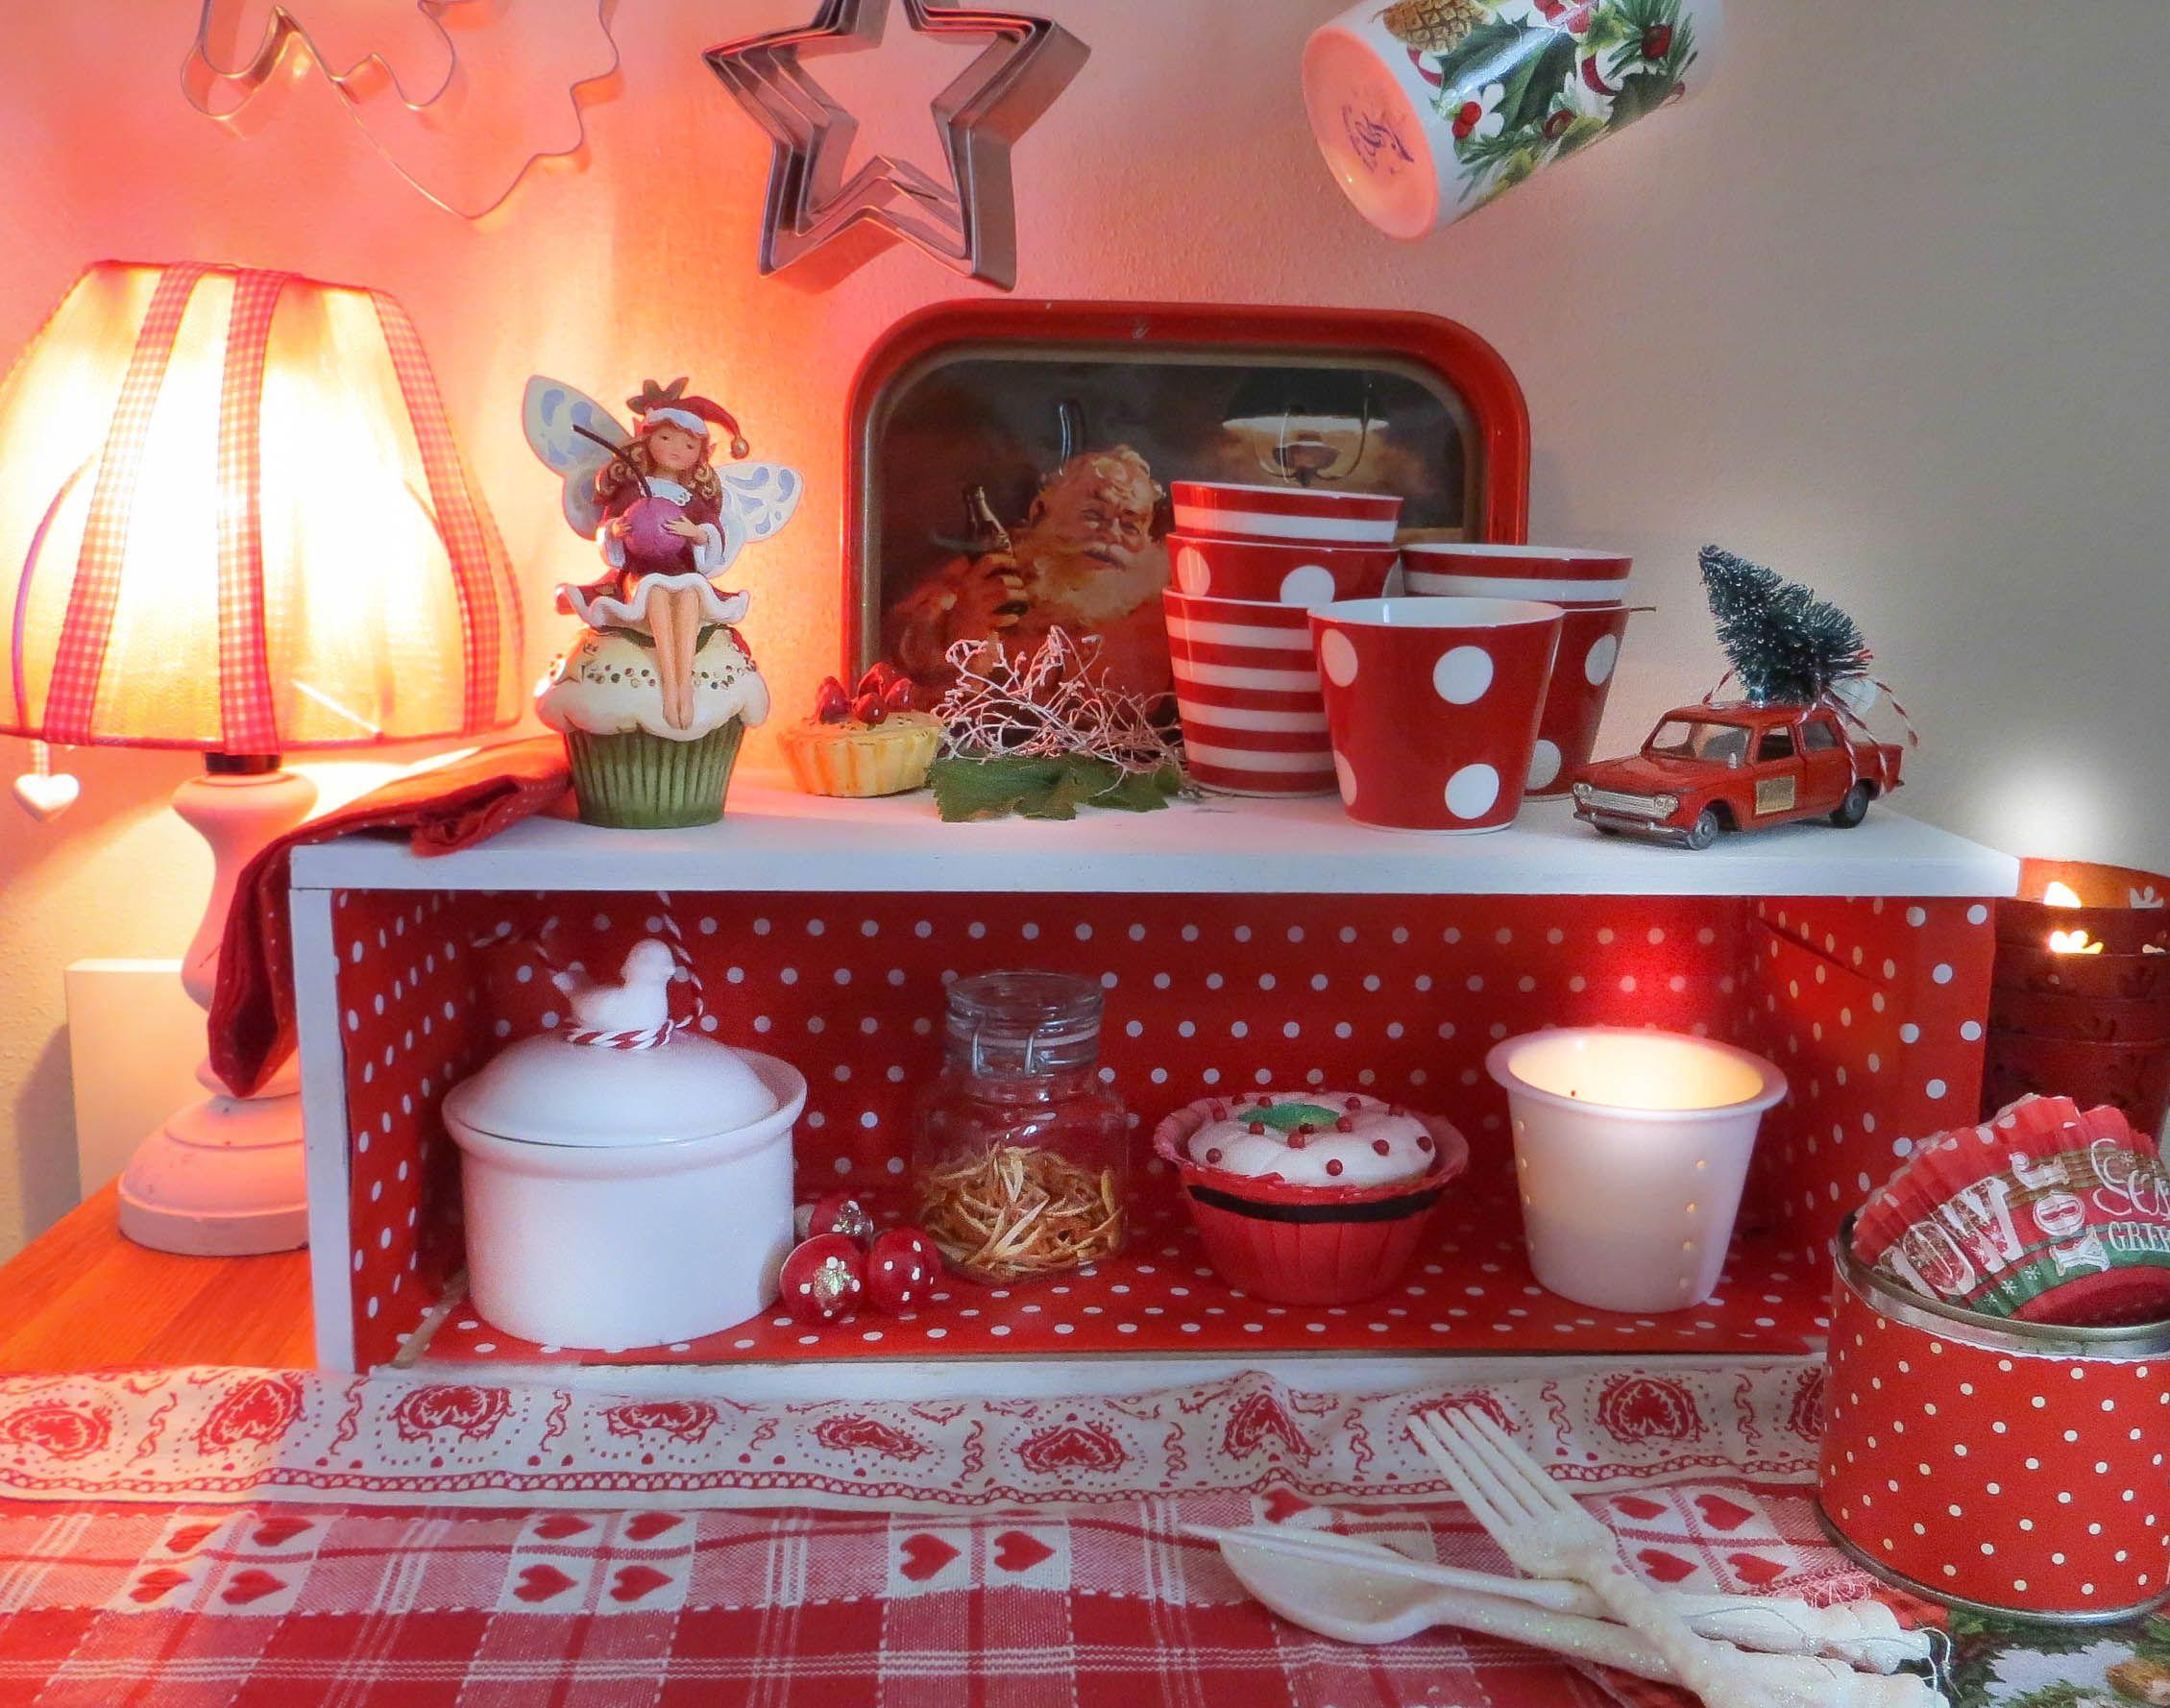 Natale rosso cucina fai da te cassetta vini cucina fai for Decorazioni cucina fai da te